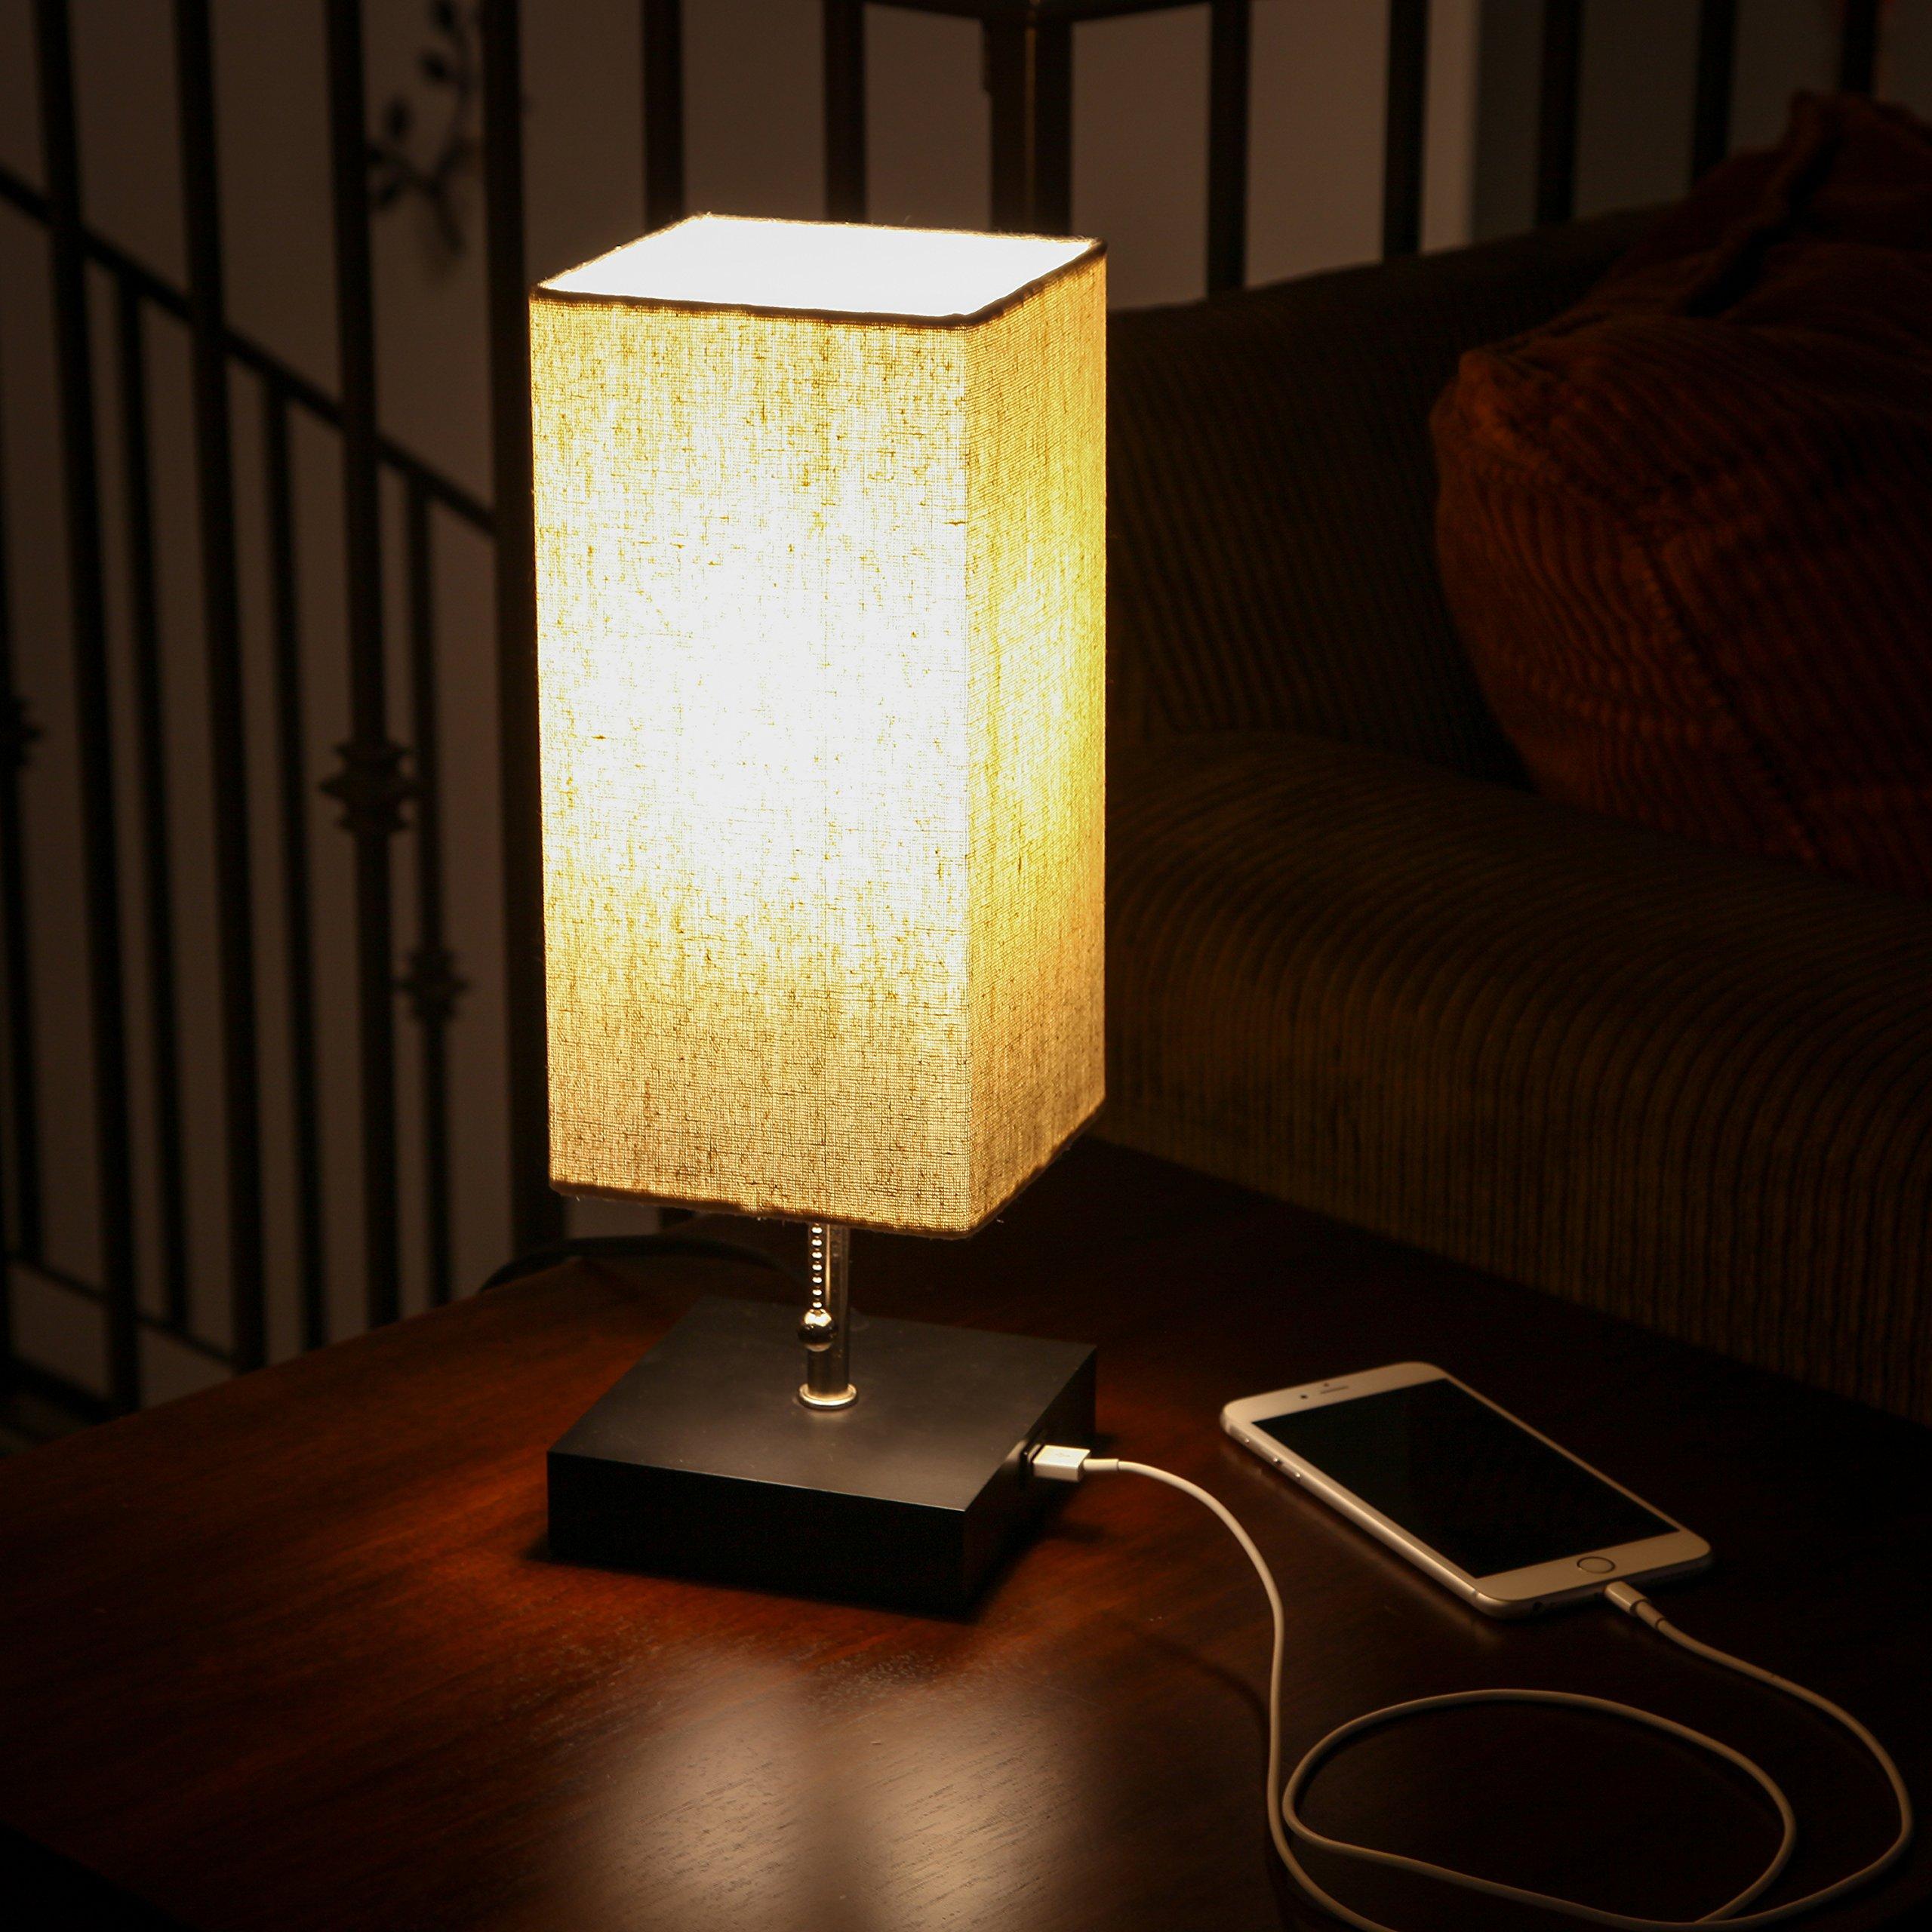 Galleon Brightech Grace Usb Table Amp Desk Lamp Soft